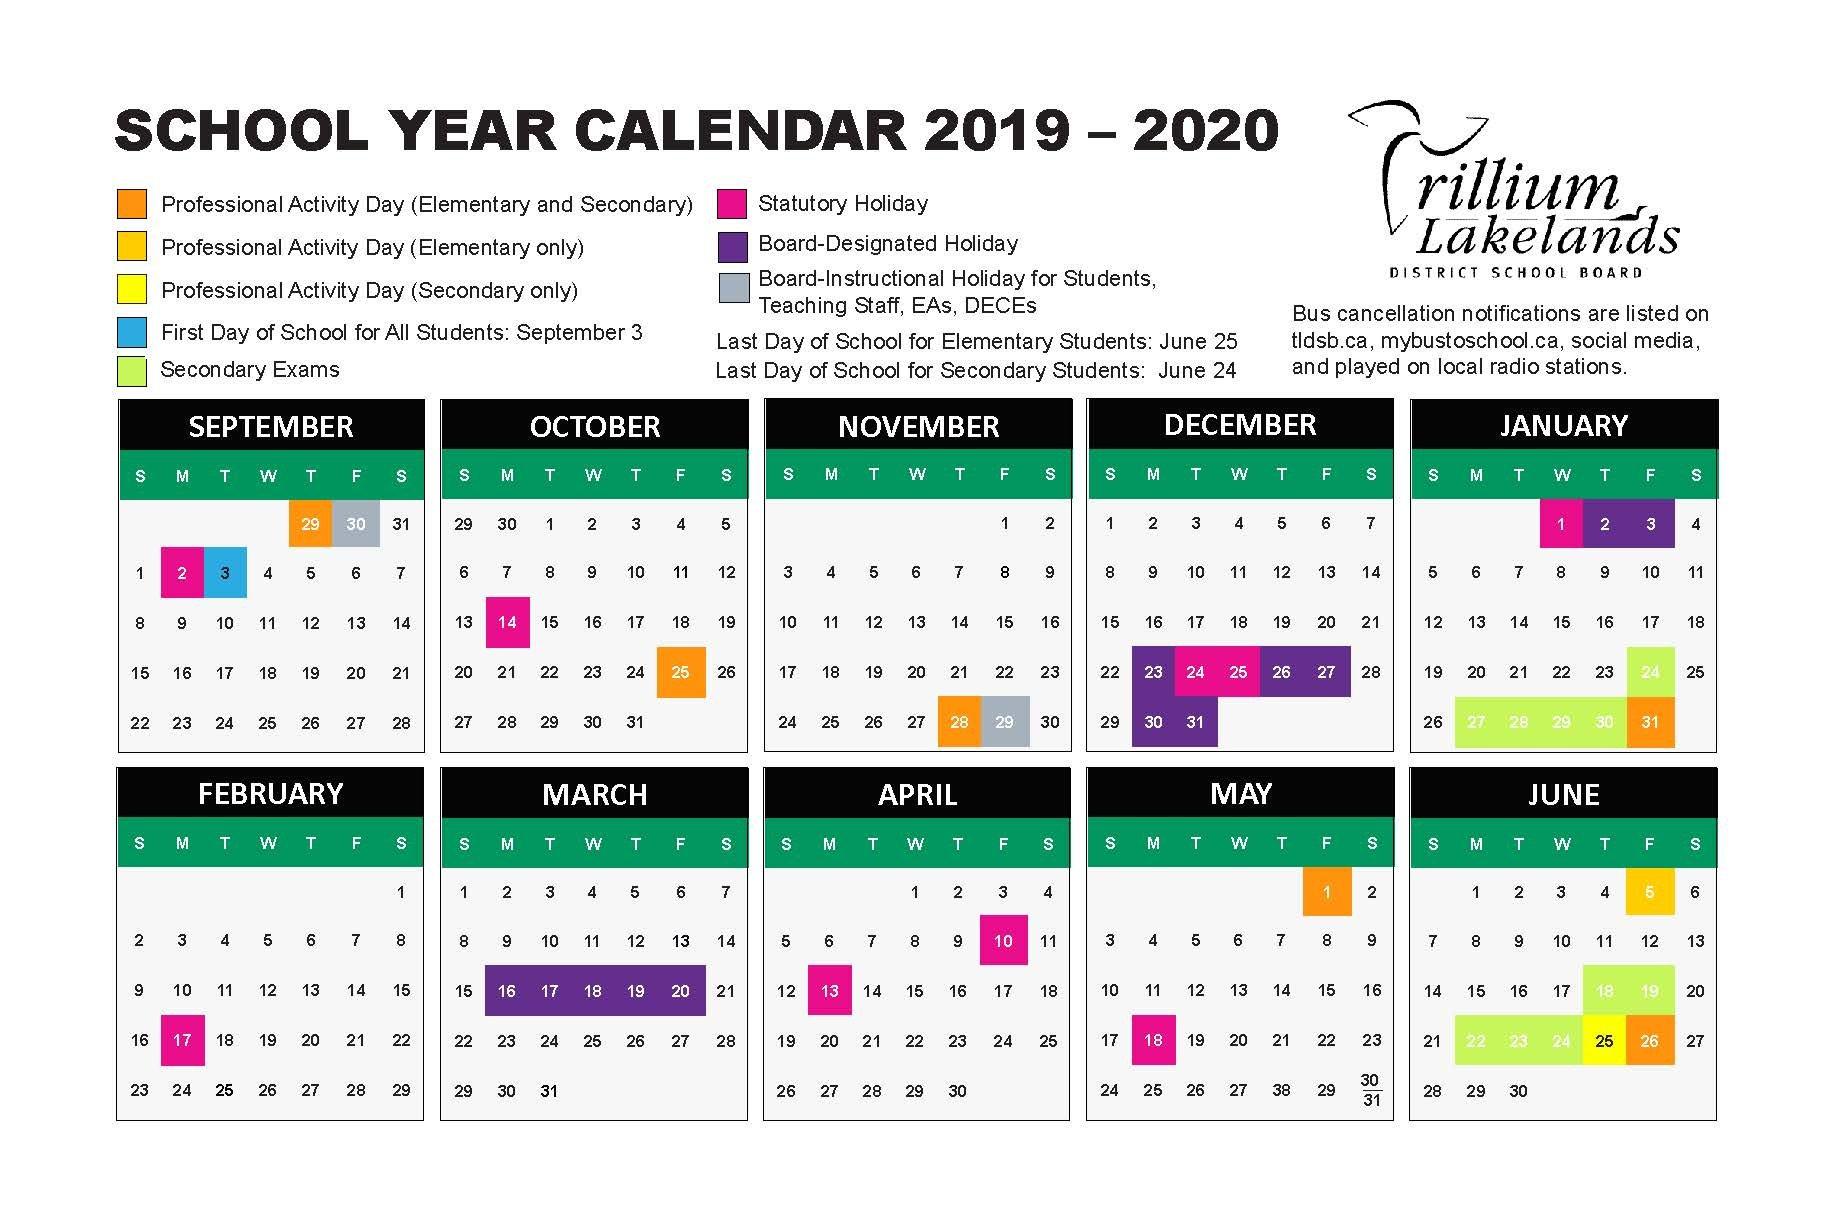 School Year Calendar – Trillium Lakelands District School Board U Of L Calendar 2019